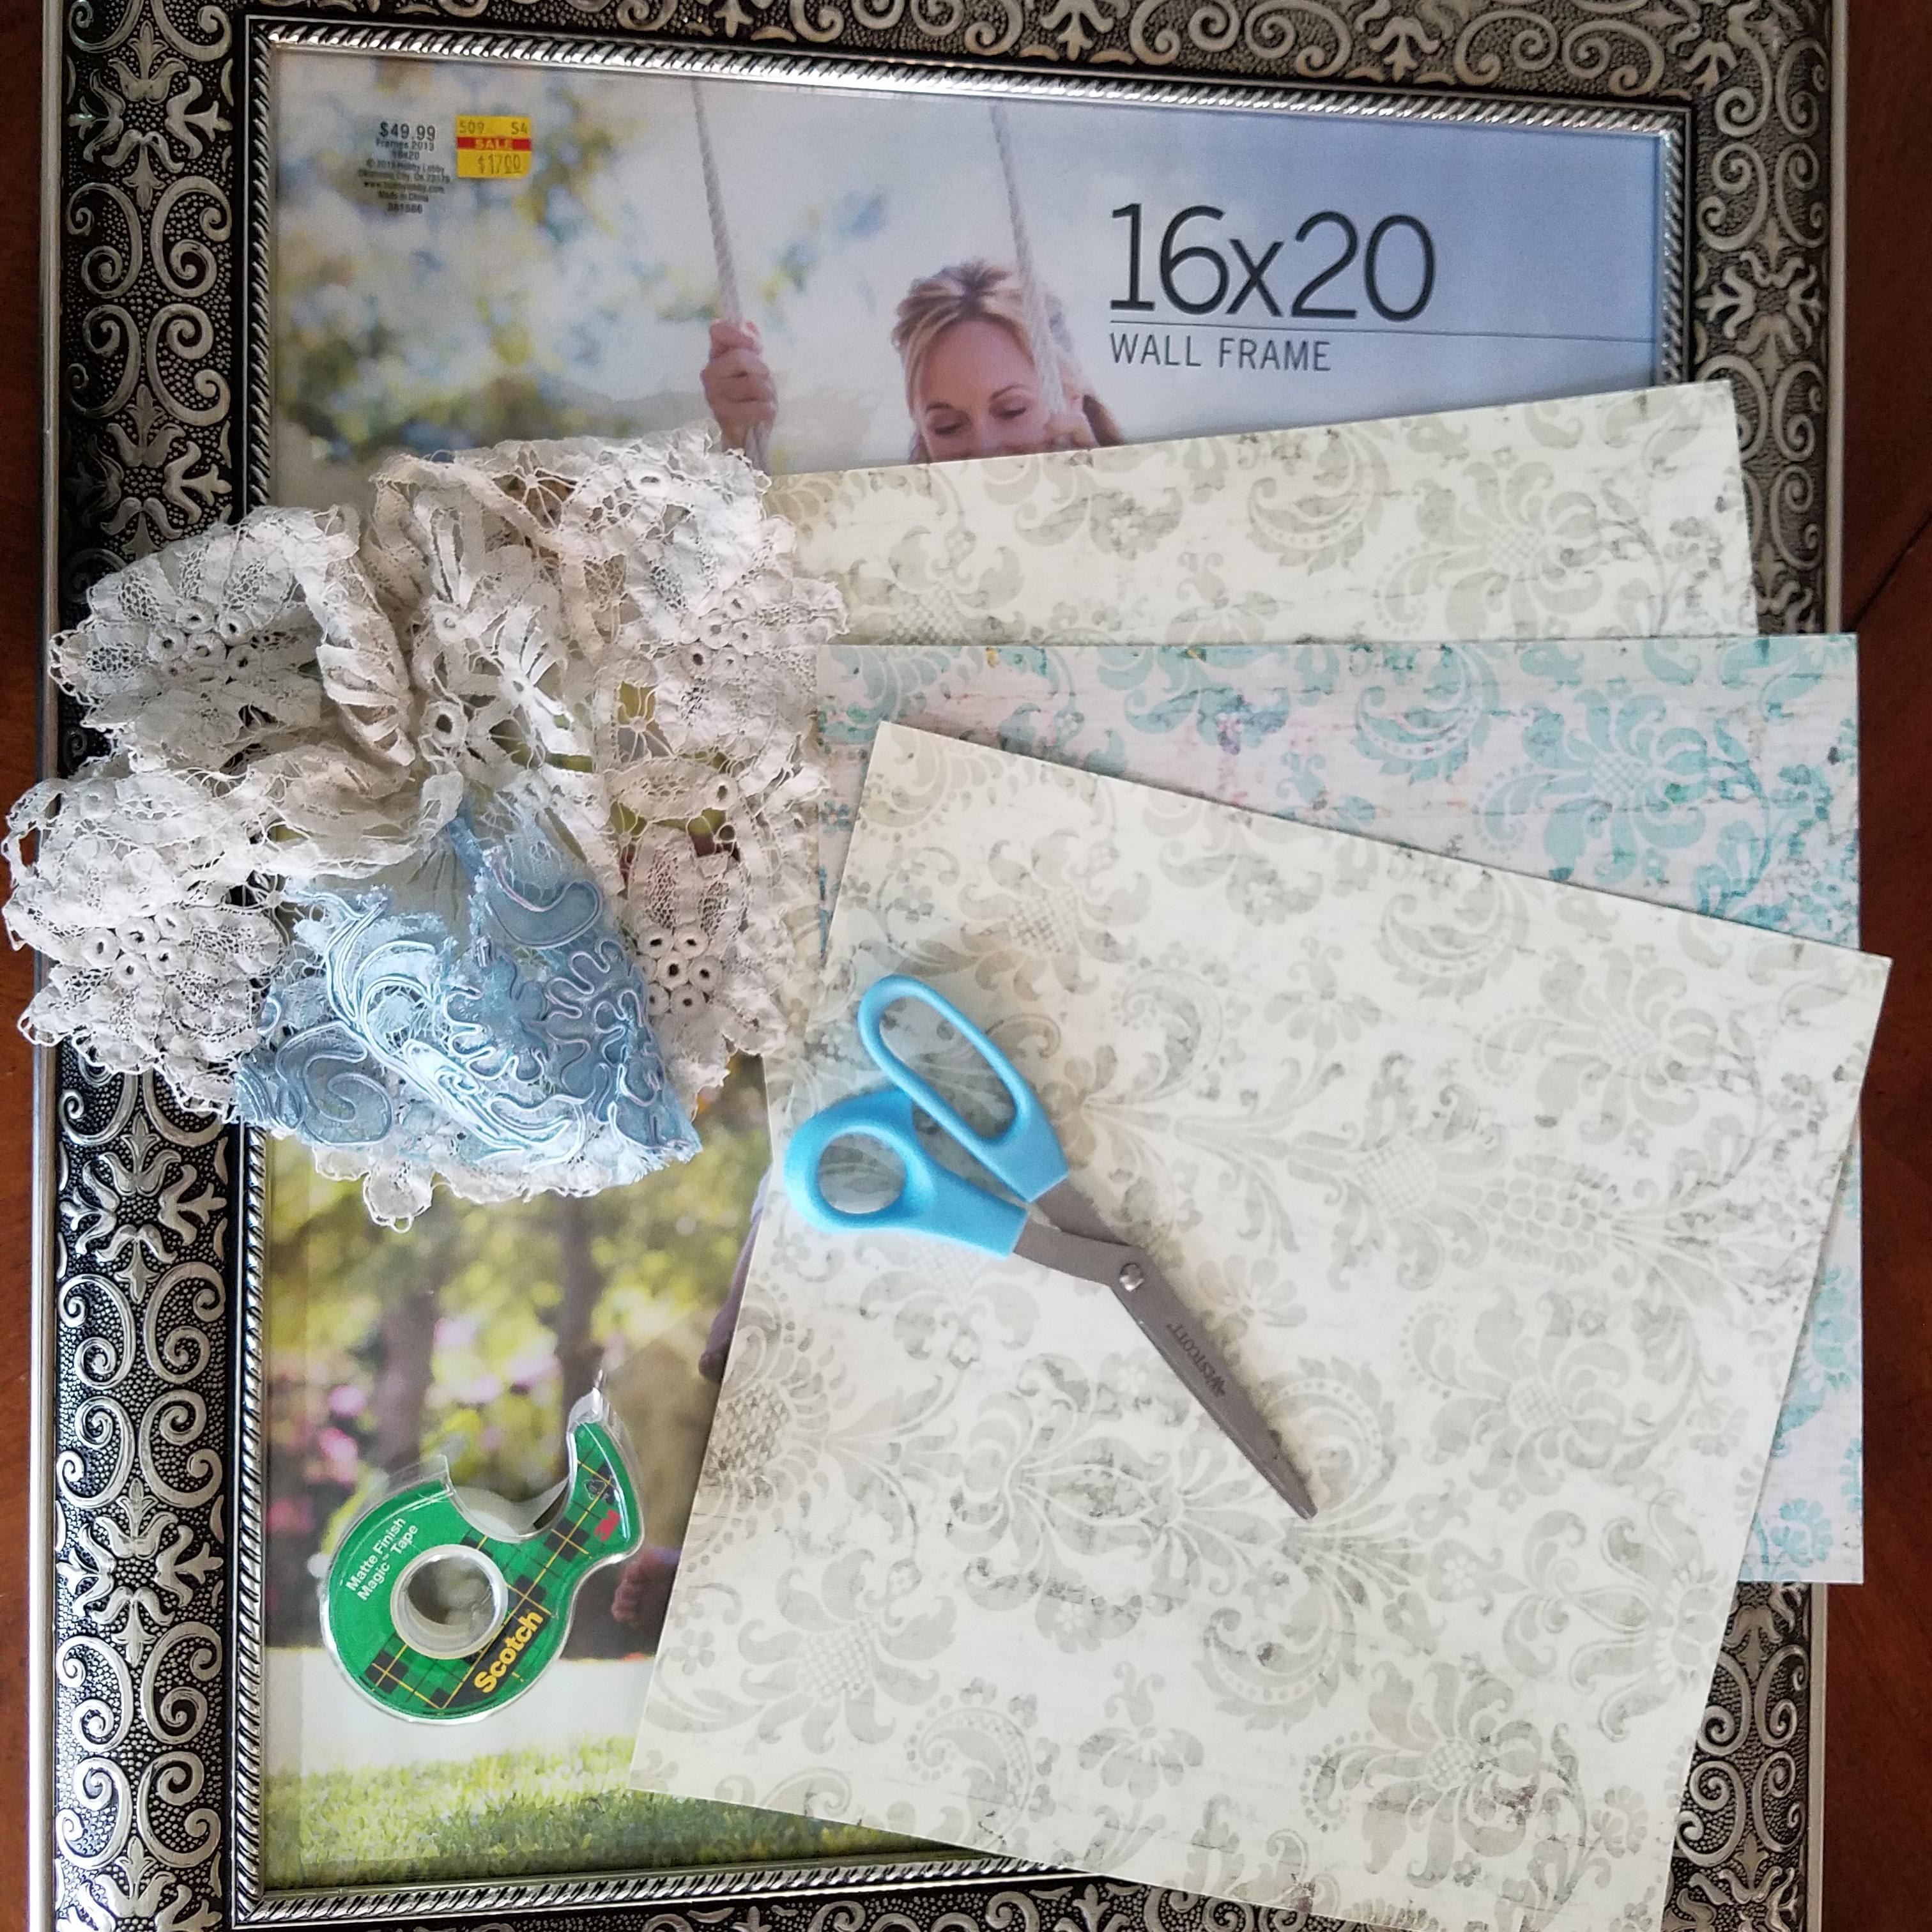 16x20 metal frame, scissors, tape, paper, doilies